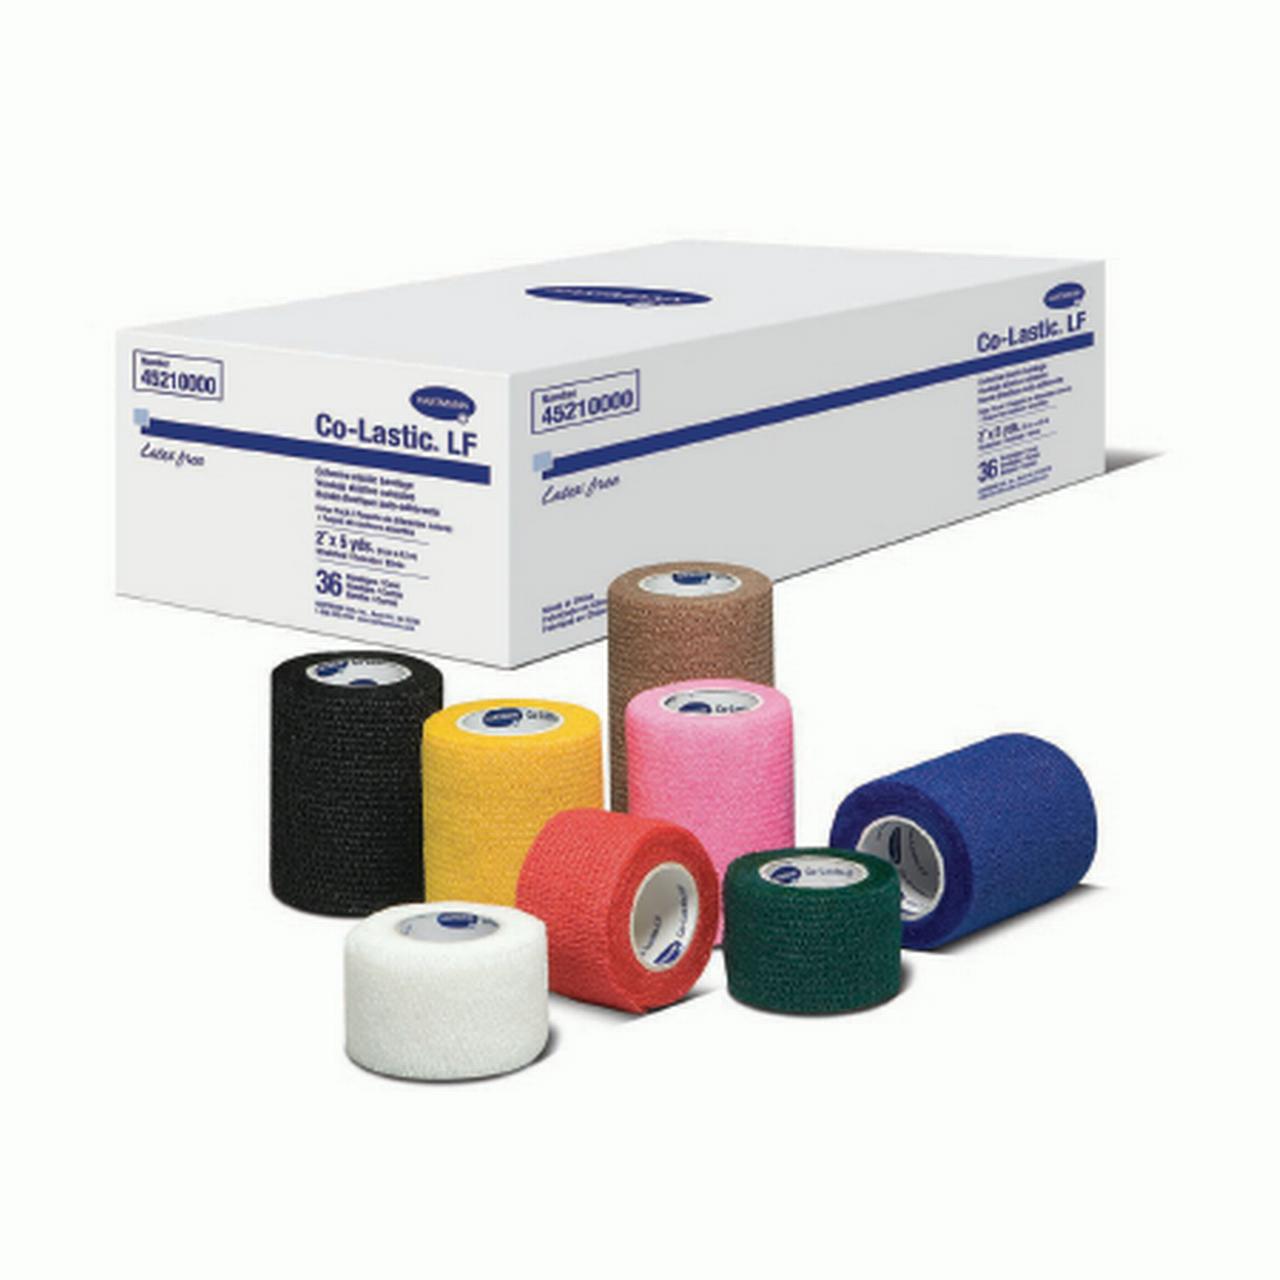 Compression Bandage CoLastic Fabric 4 Inch X 5 Yard (1/EA)